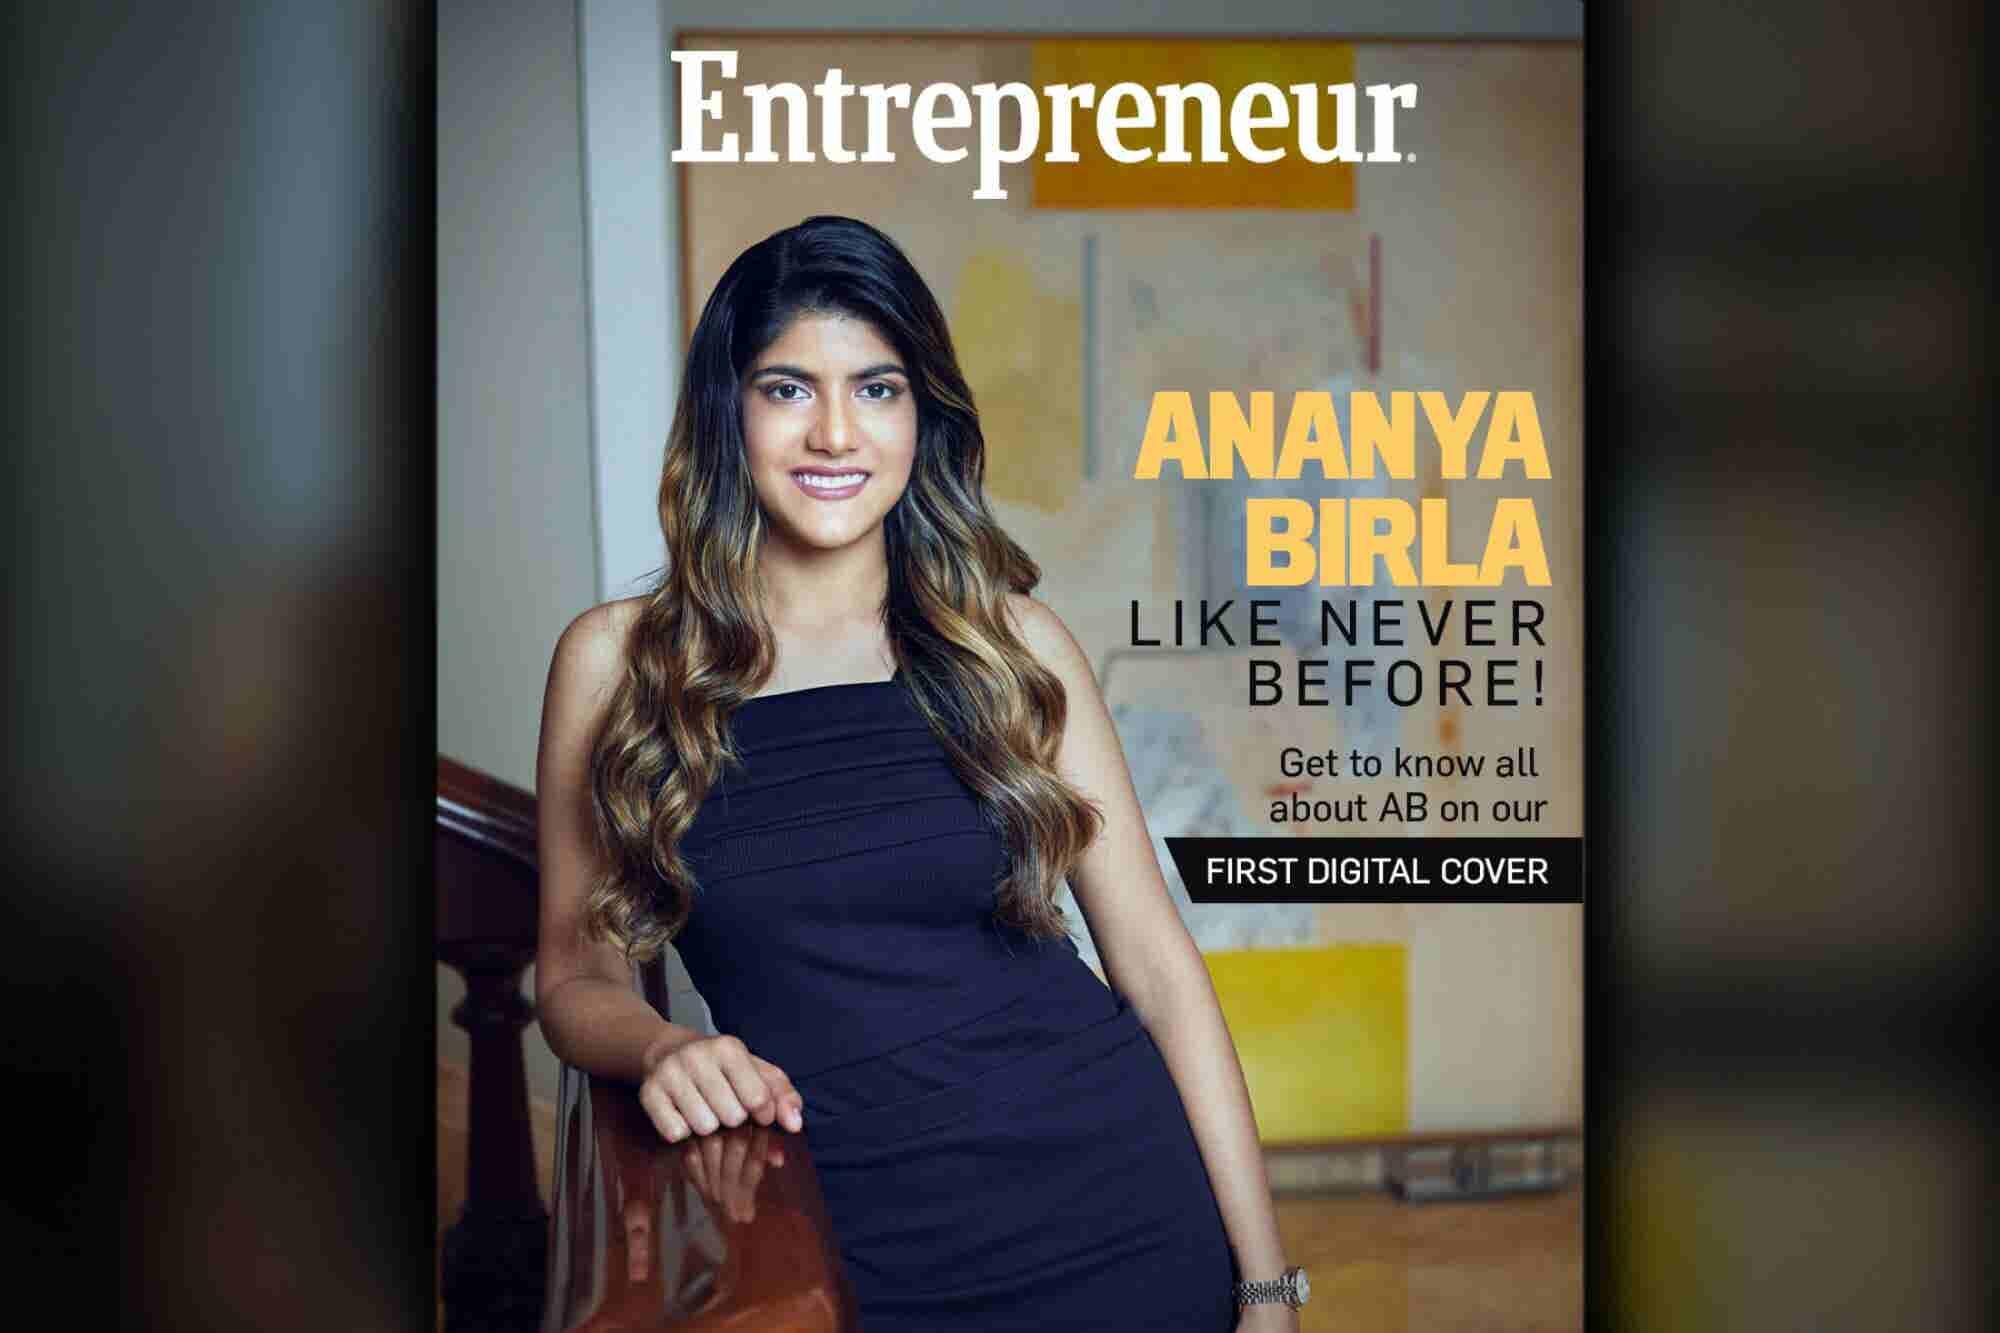 Entrepreneur India's First-ever Digital Cover Dons the Dauntless Ananya Birla